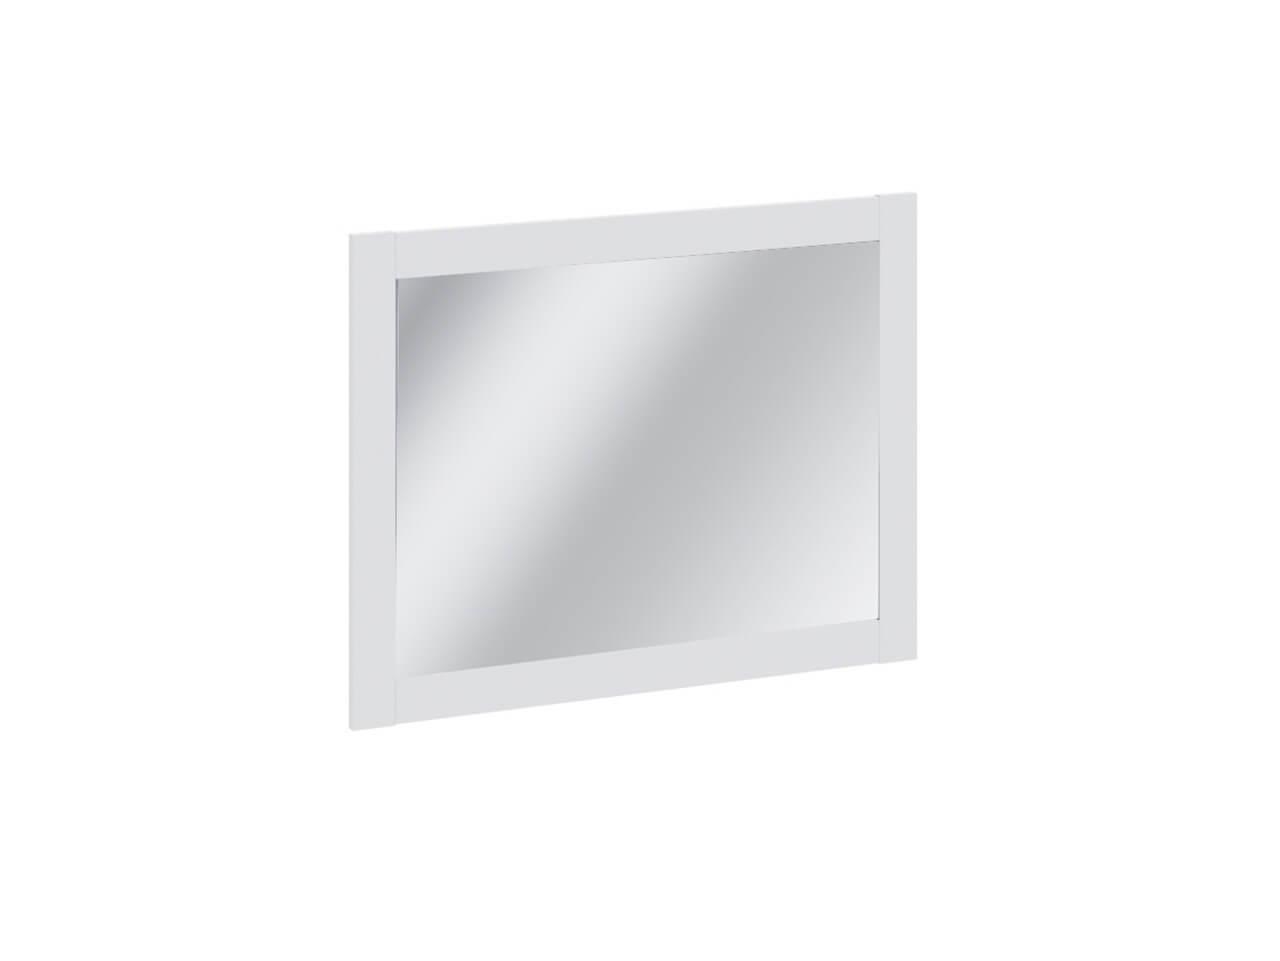 Панель с зеркалом Ривьера ТД-241-06-01 845х20х650